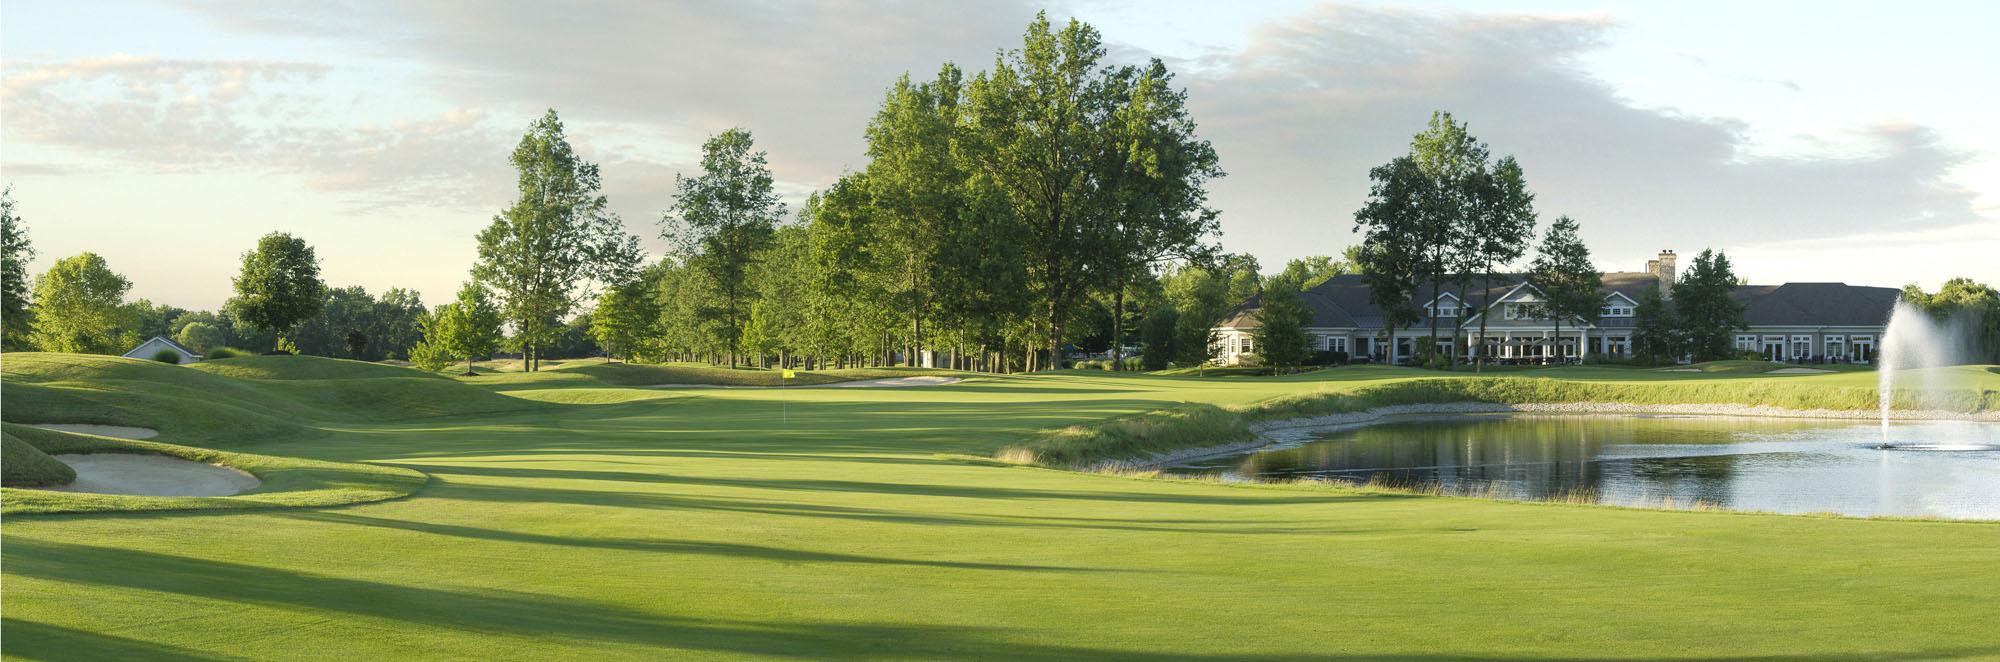 Golf Course Image - Jefferson Country Club No. 18